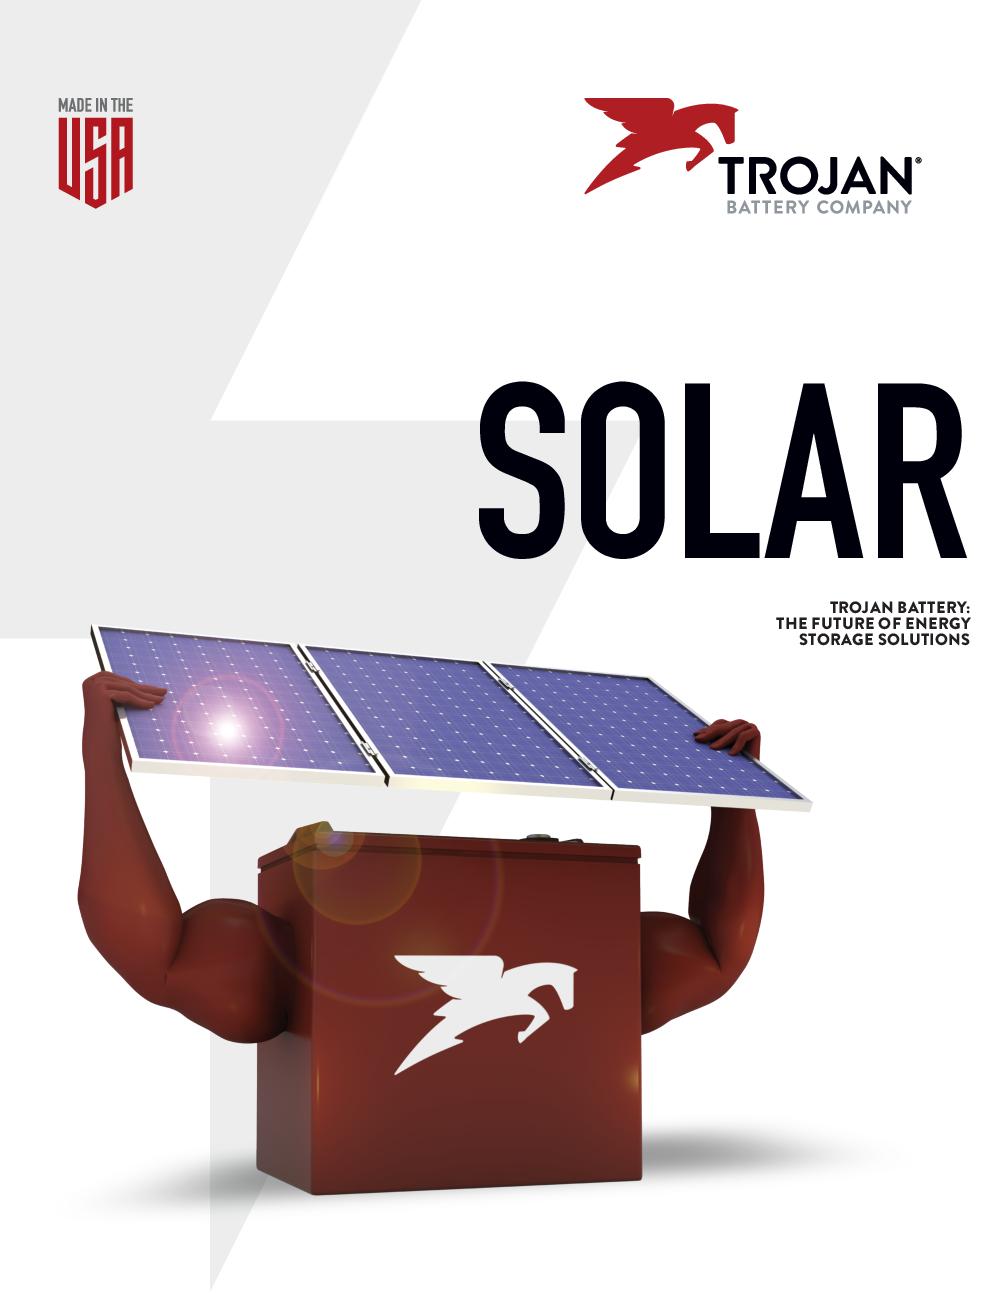 TrojanBattery_SOLAR